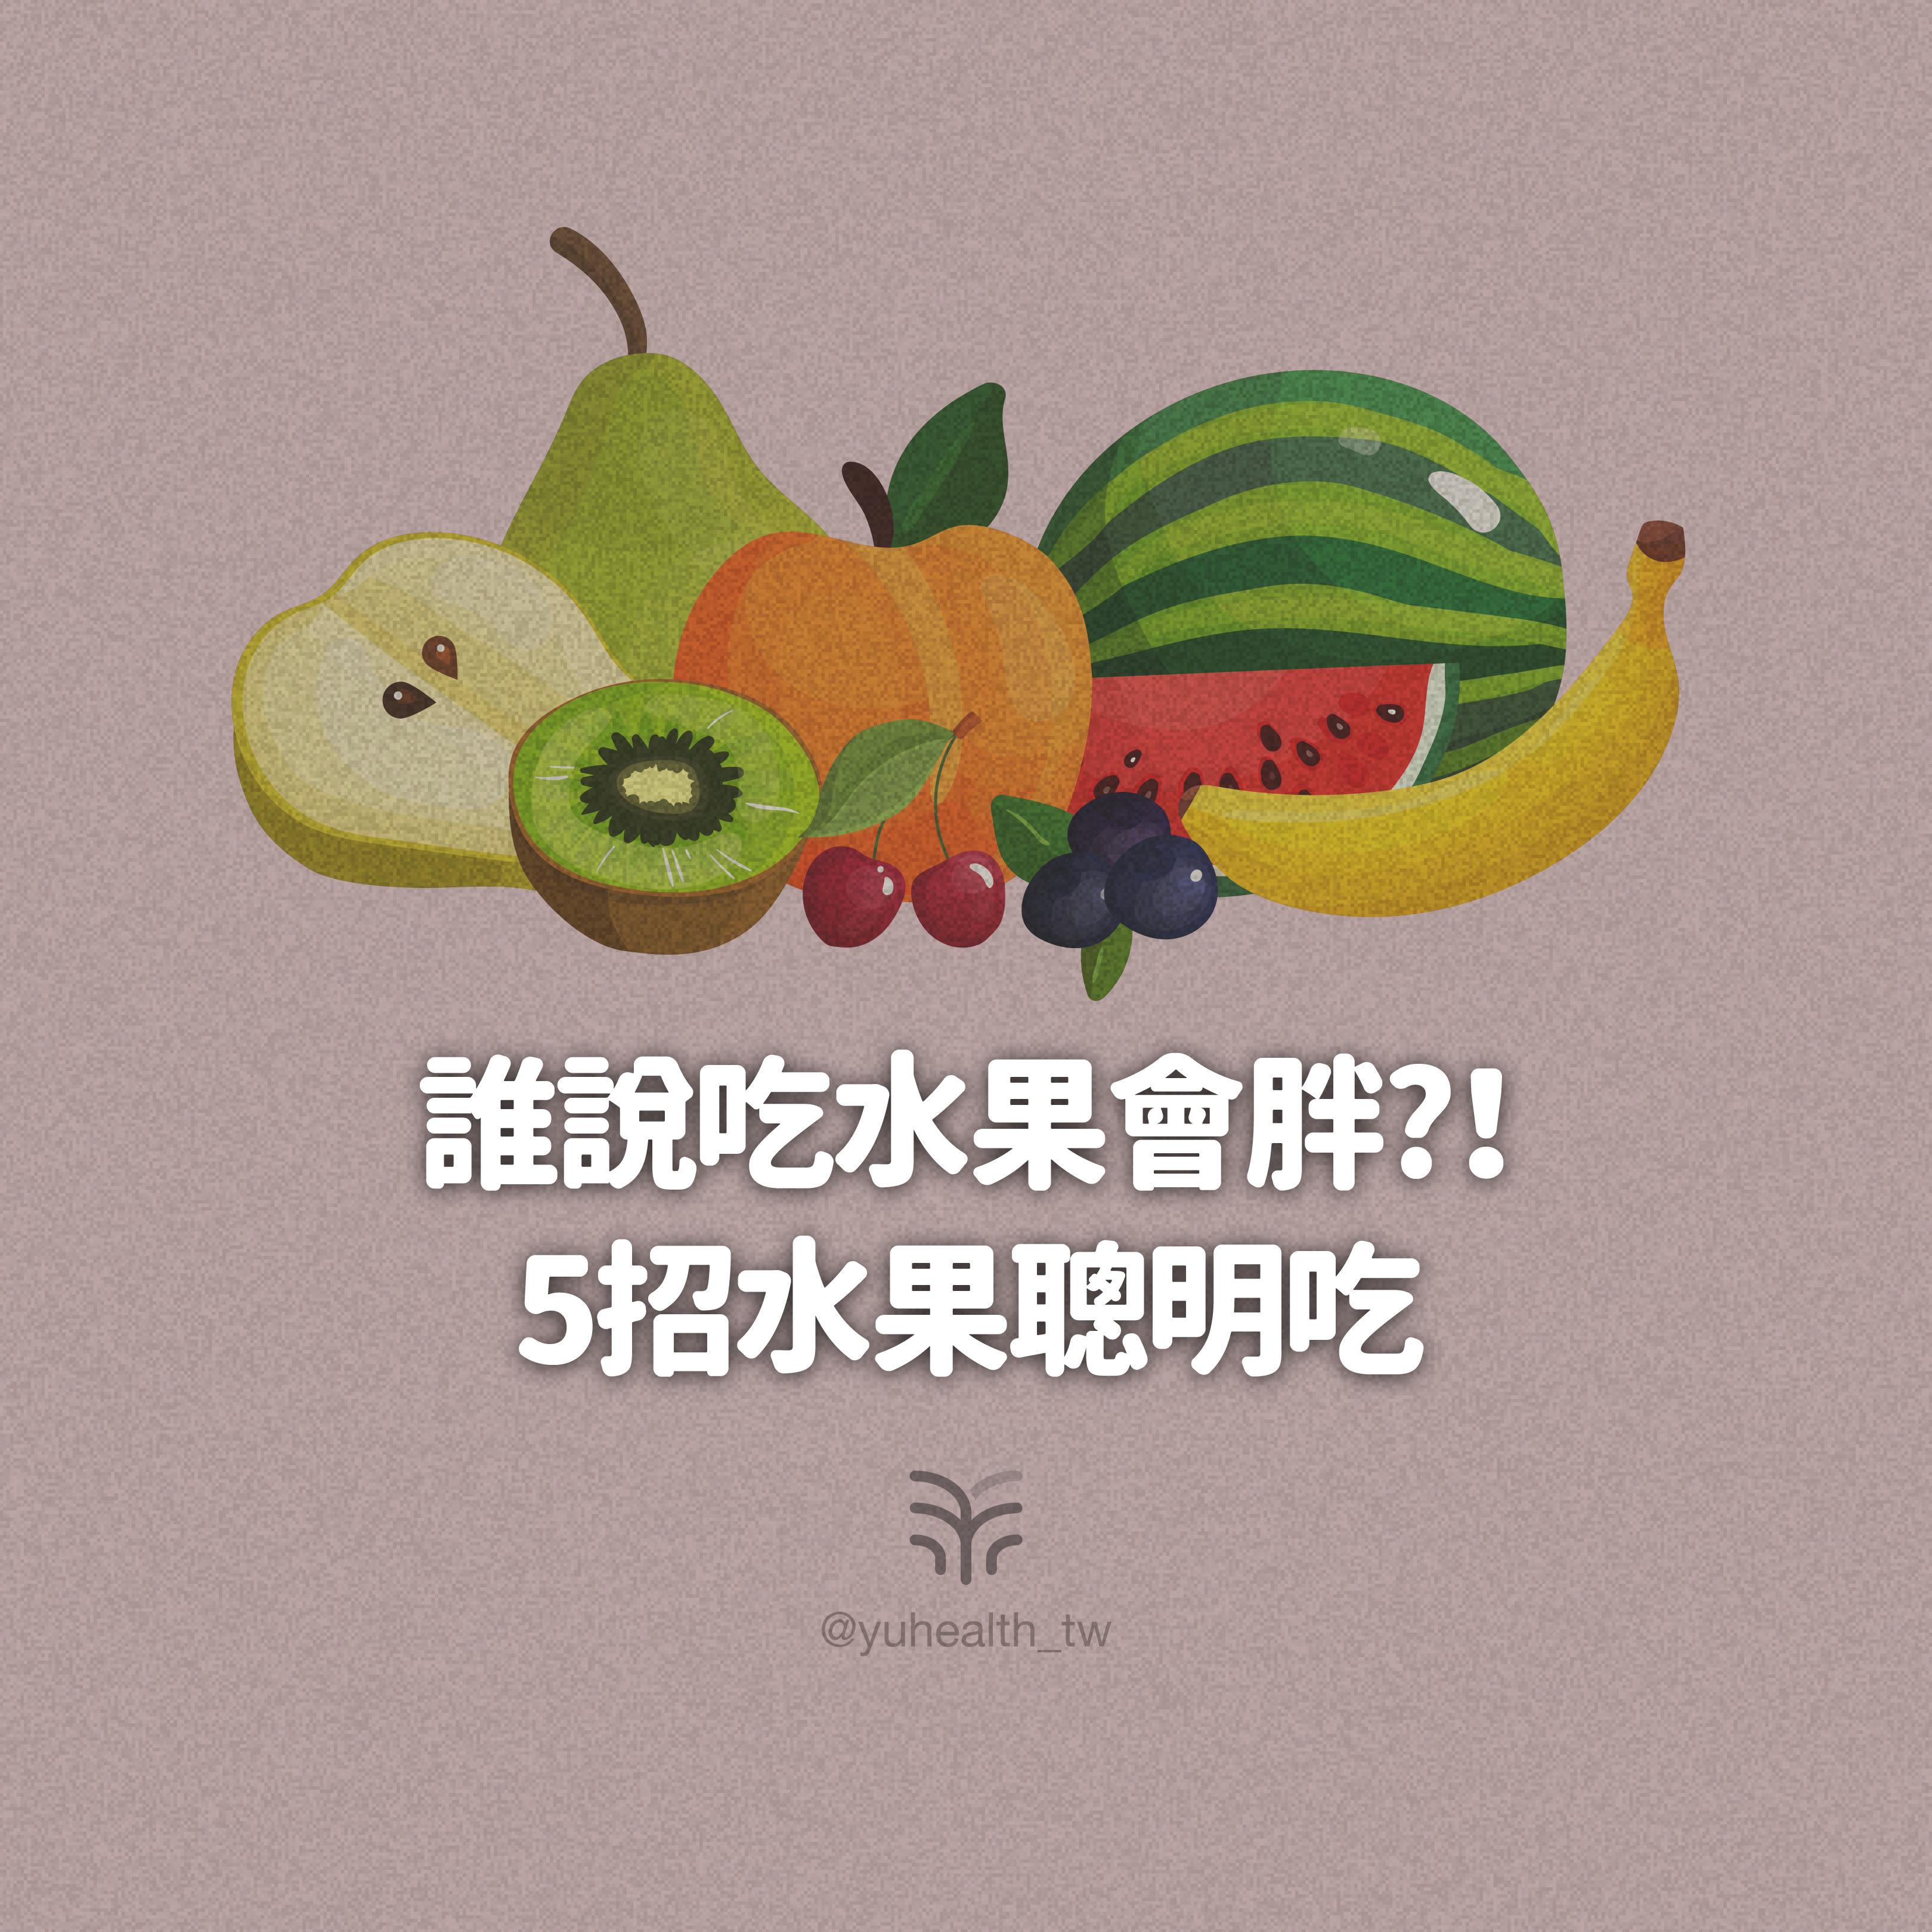 EP39[減重營養]誰說吃水果會胖?5招水果聰明吃!